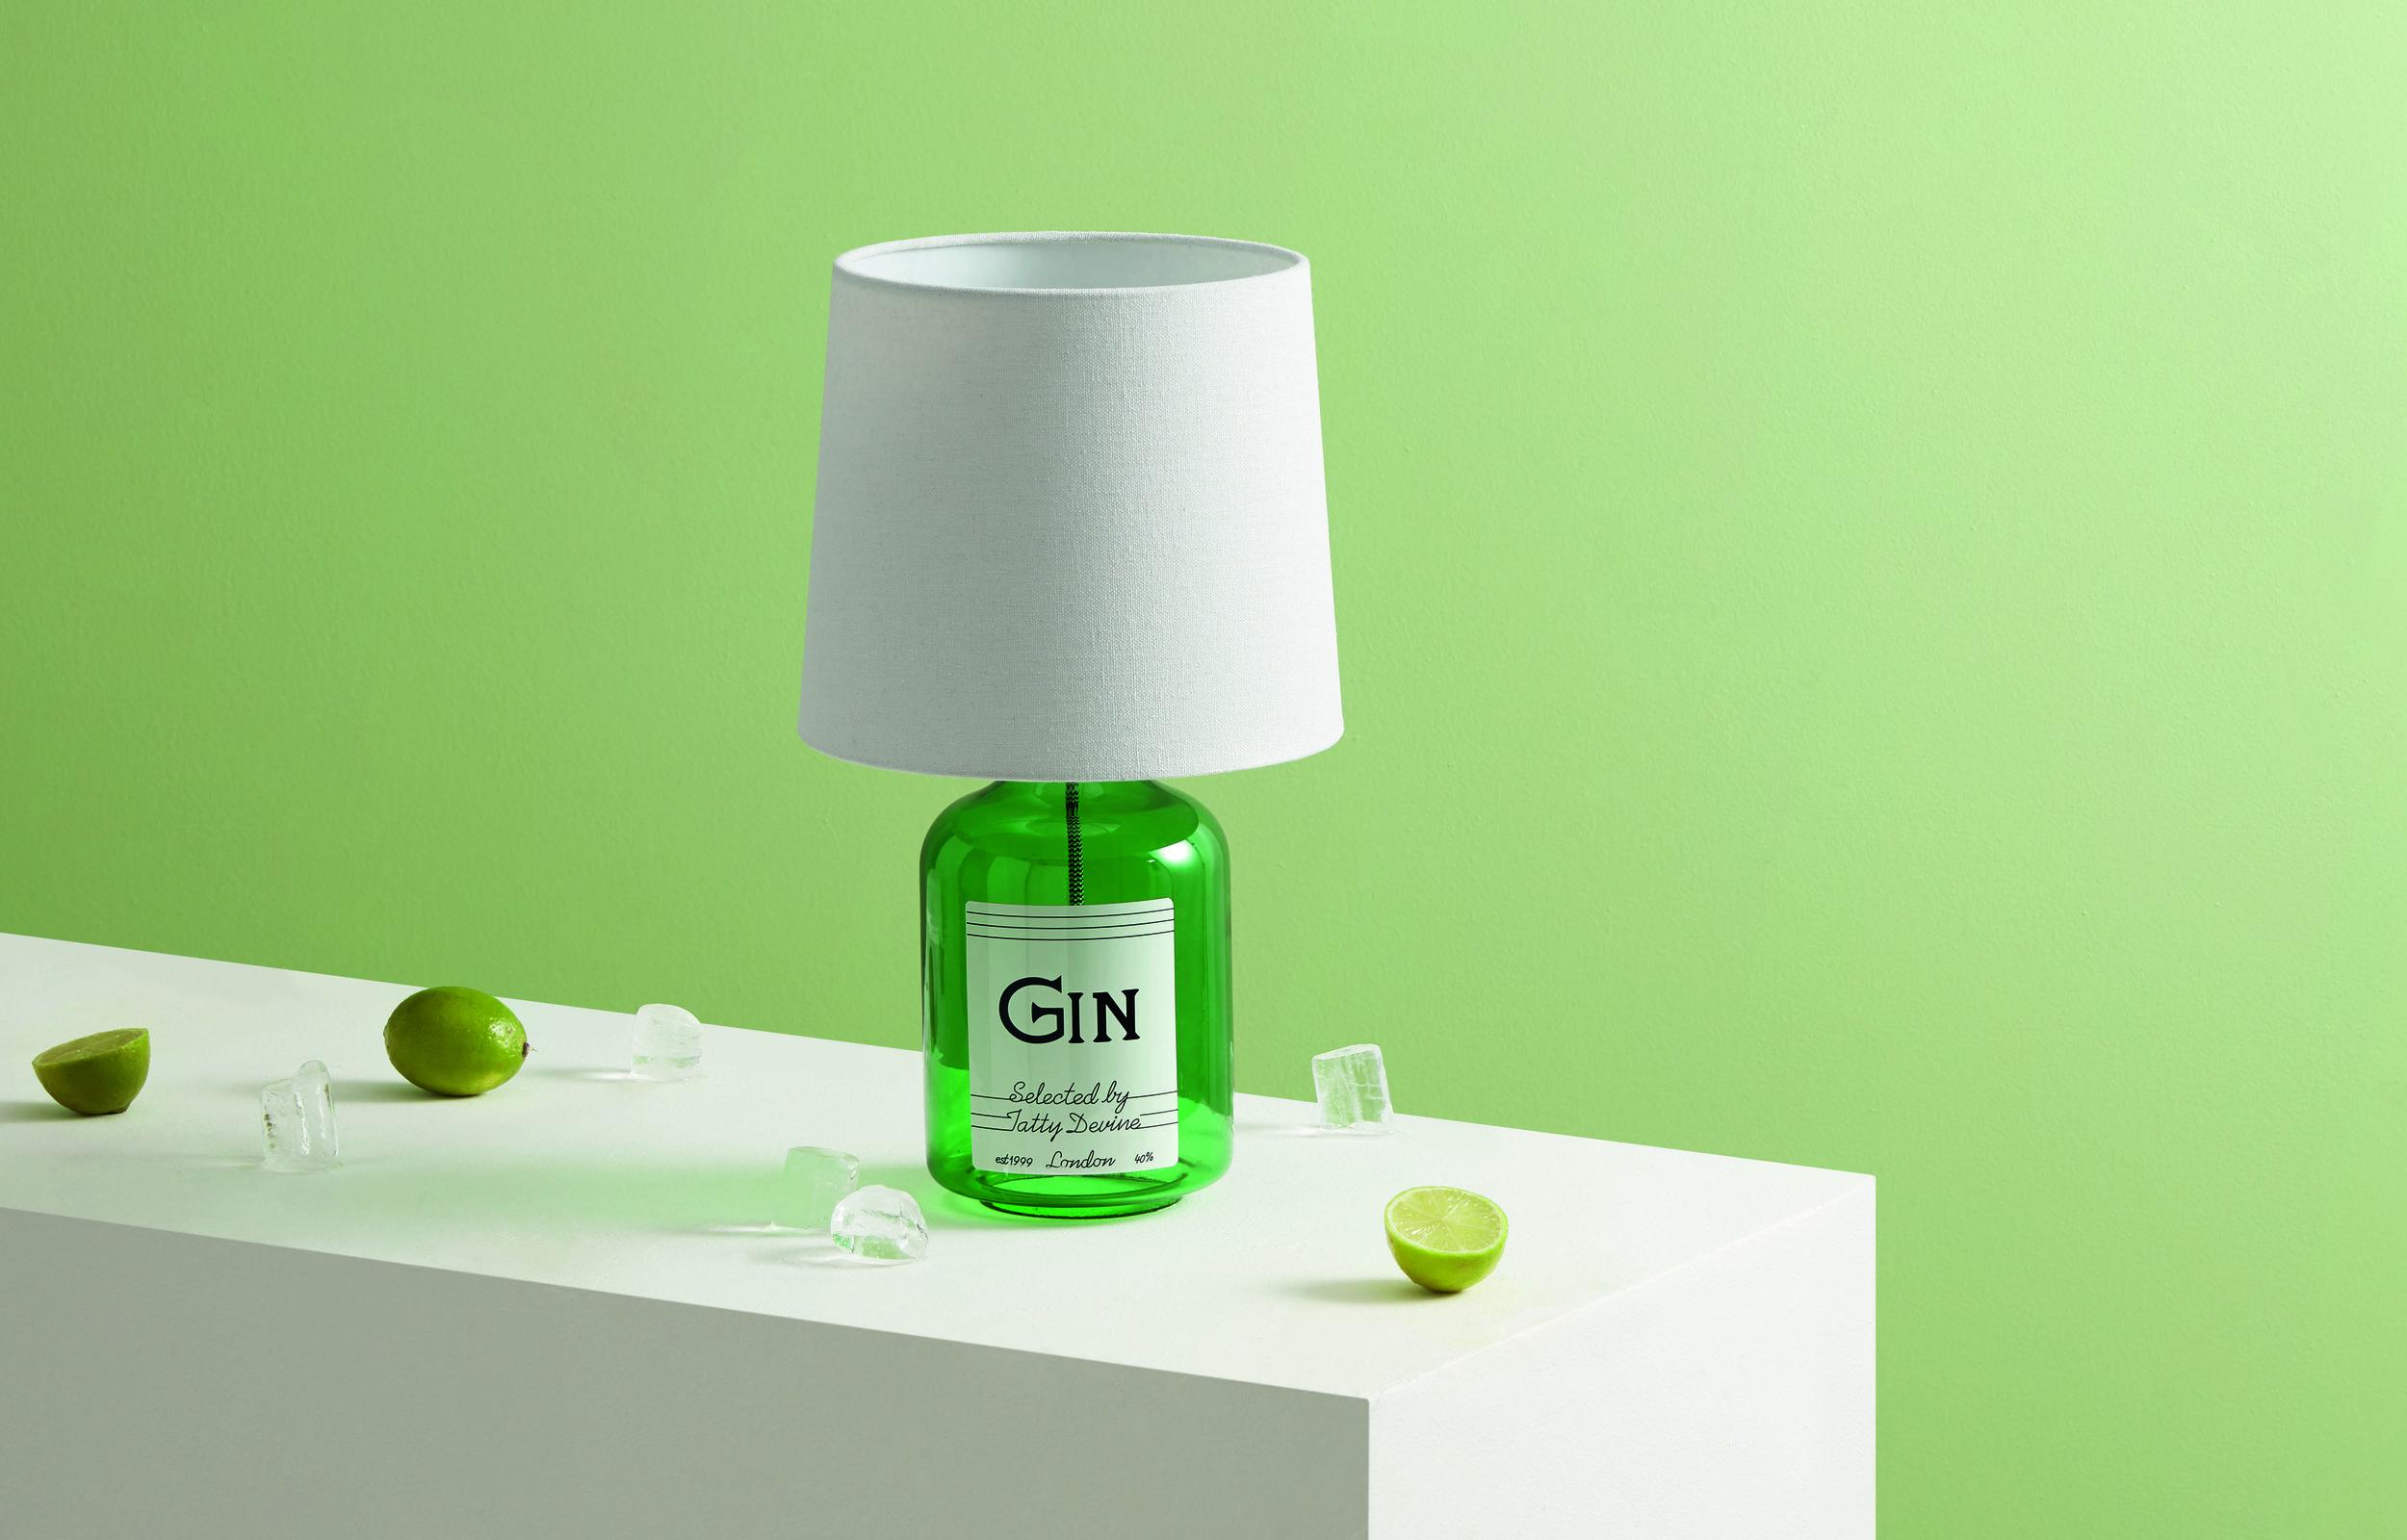 TLPTAT001GRN-UK_Tatty_Devine_Gin_Bottle_Table_Lamp_Green_PR02.jpg